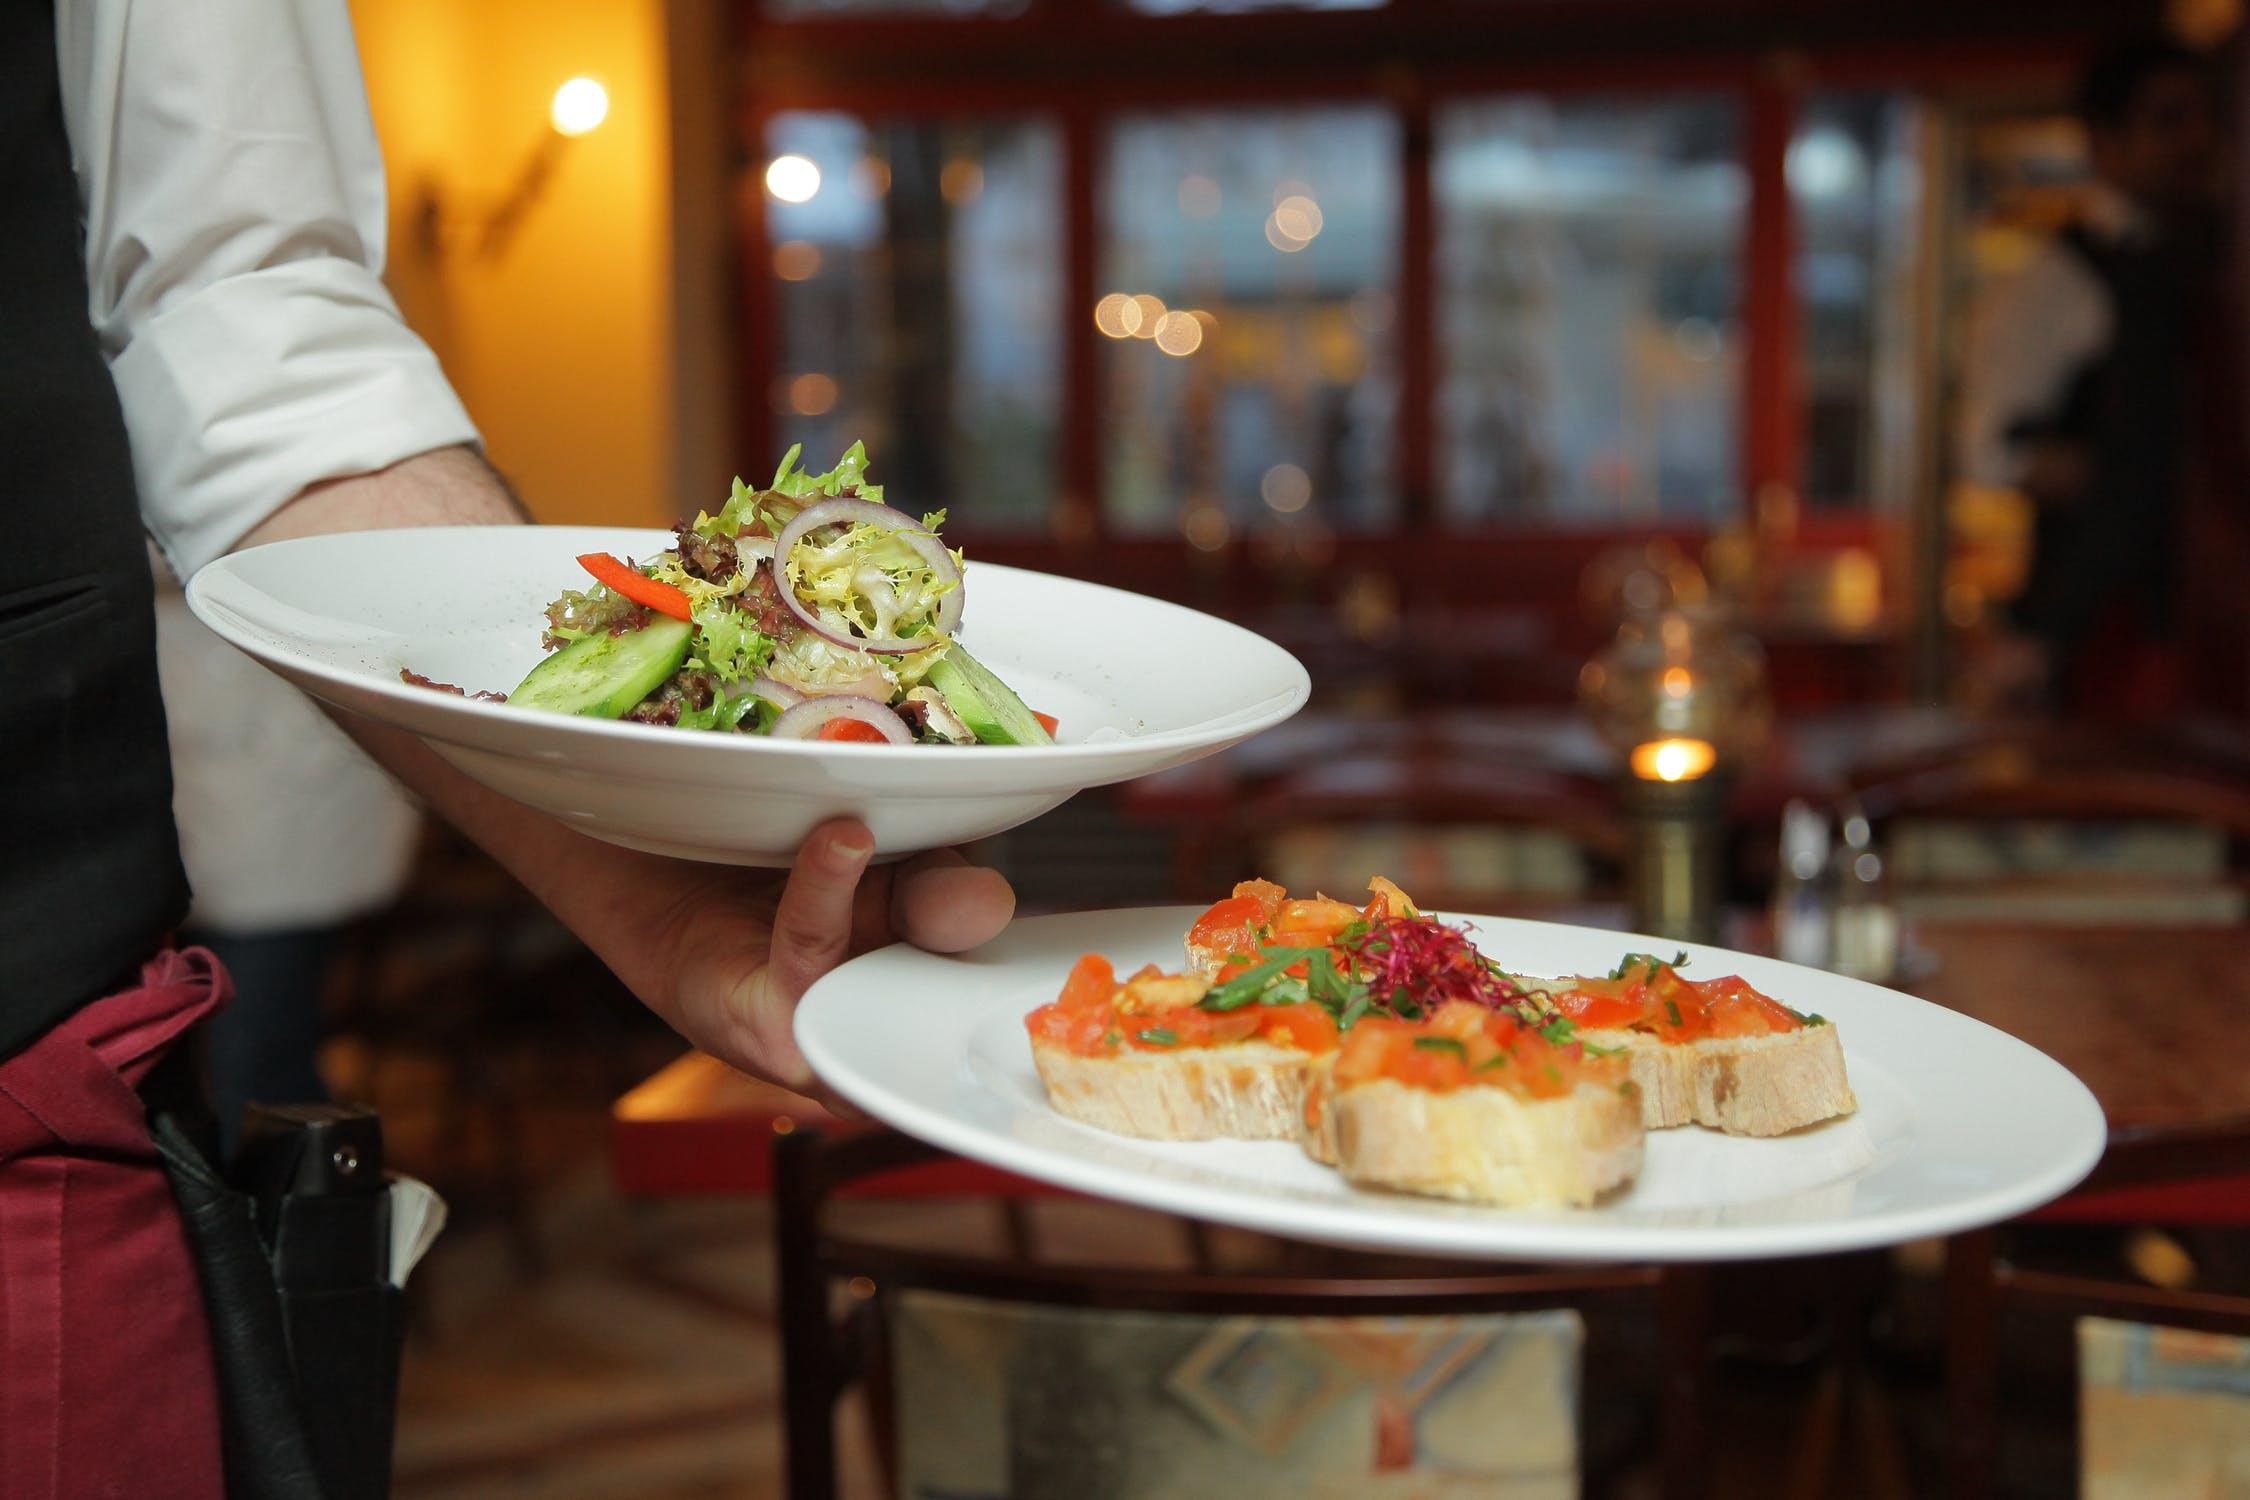 restaurant stocktaking services